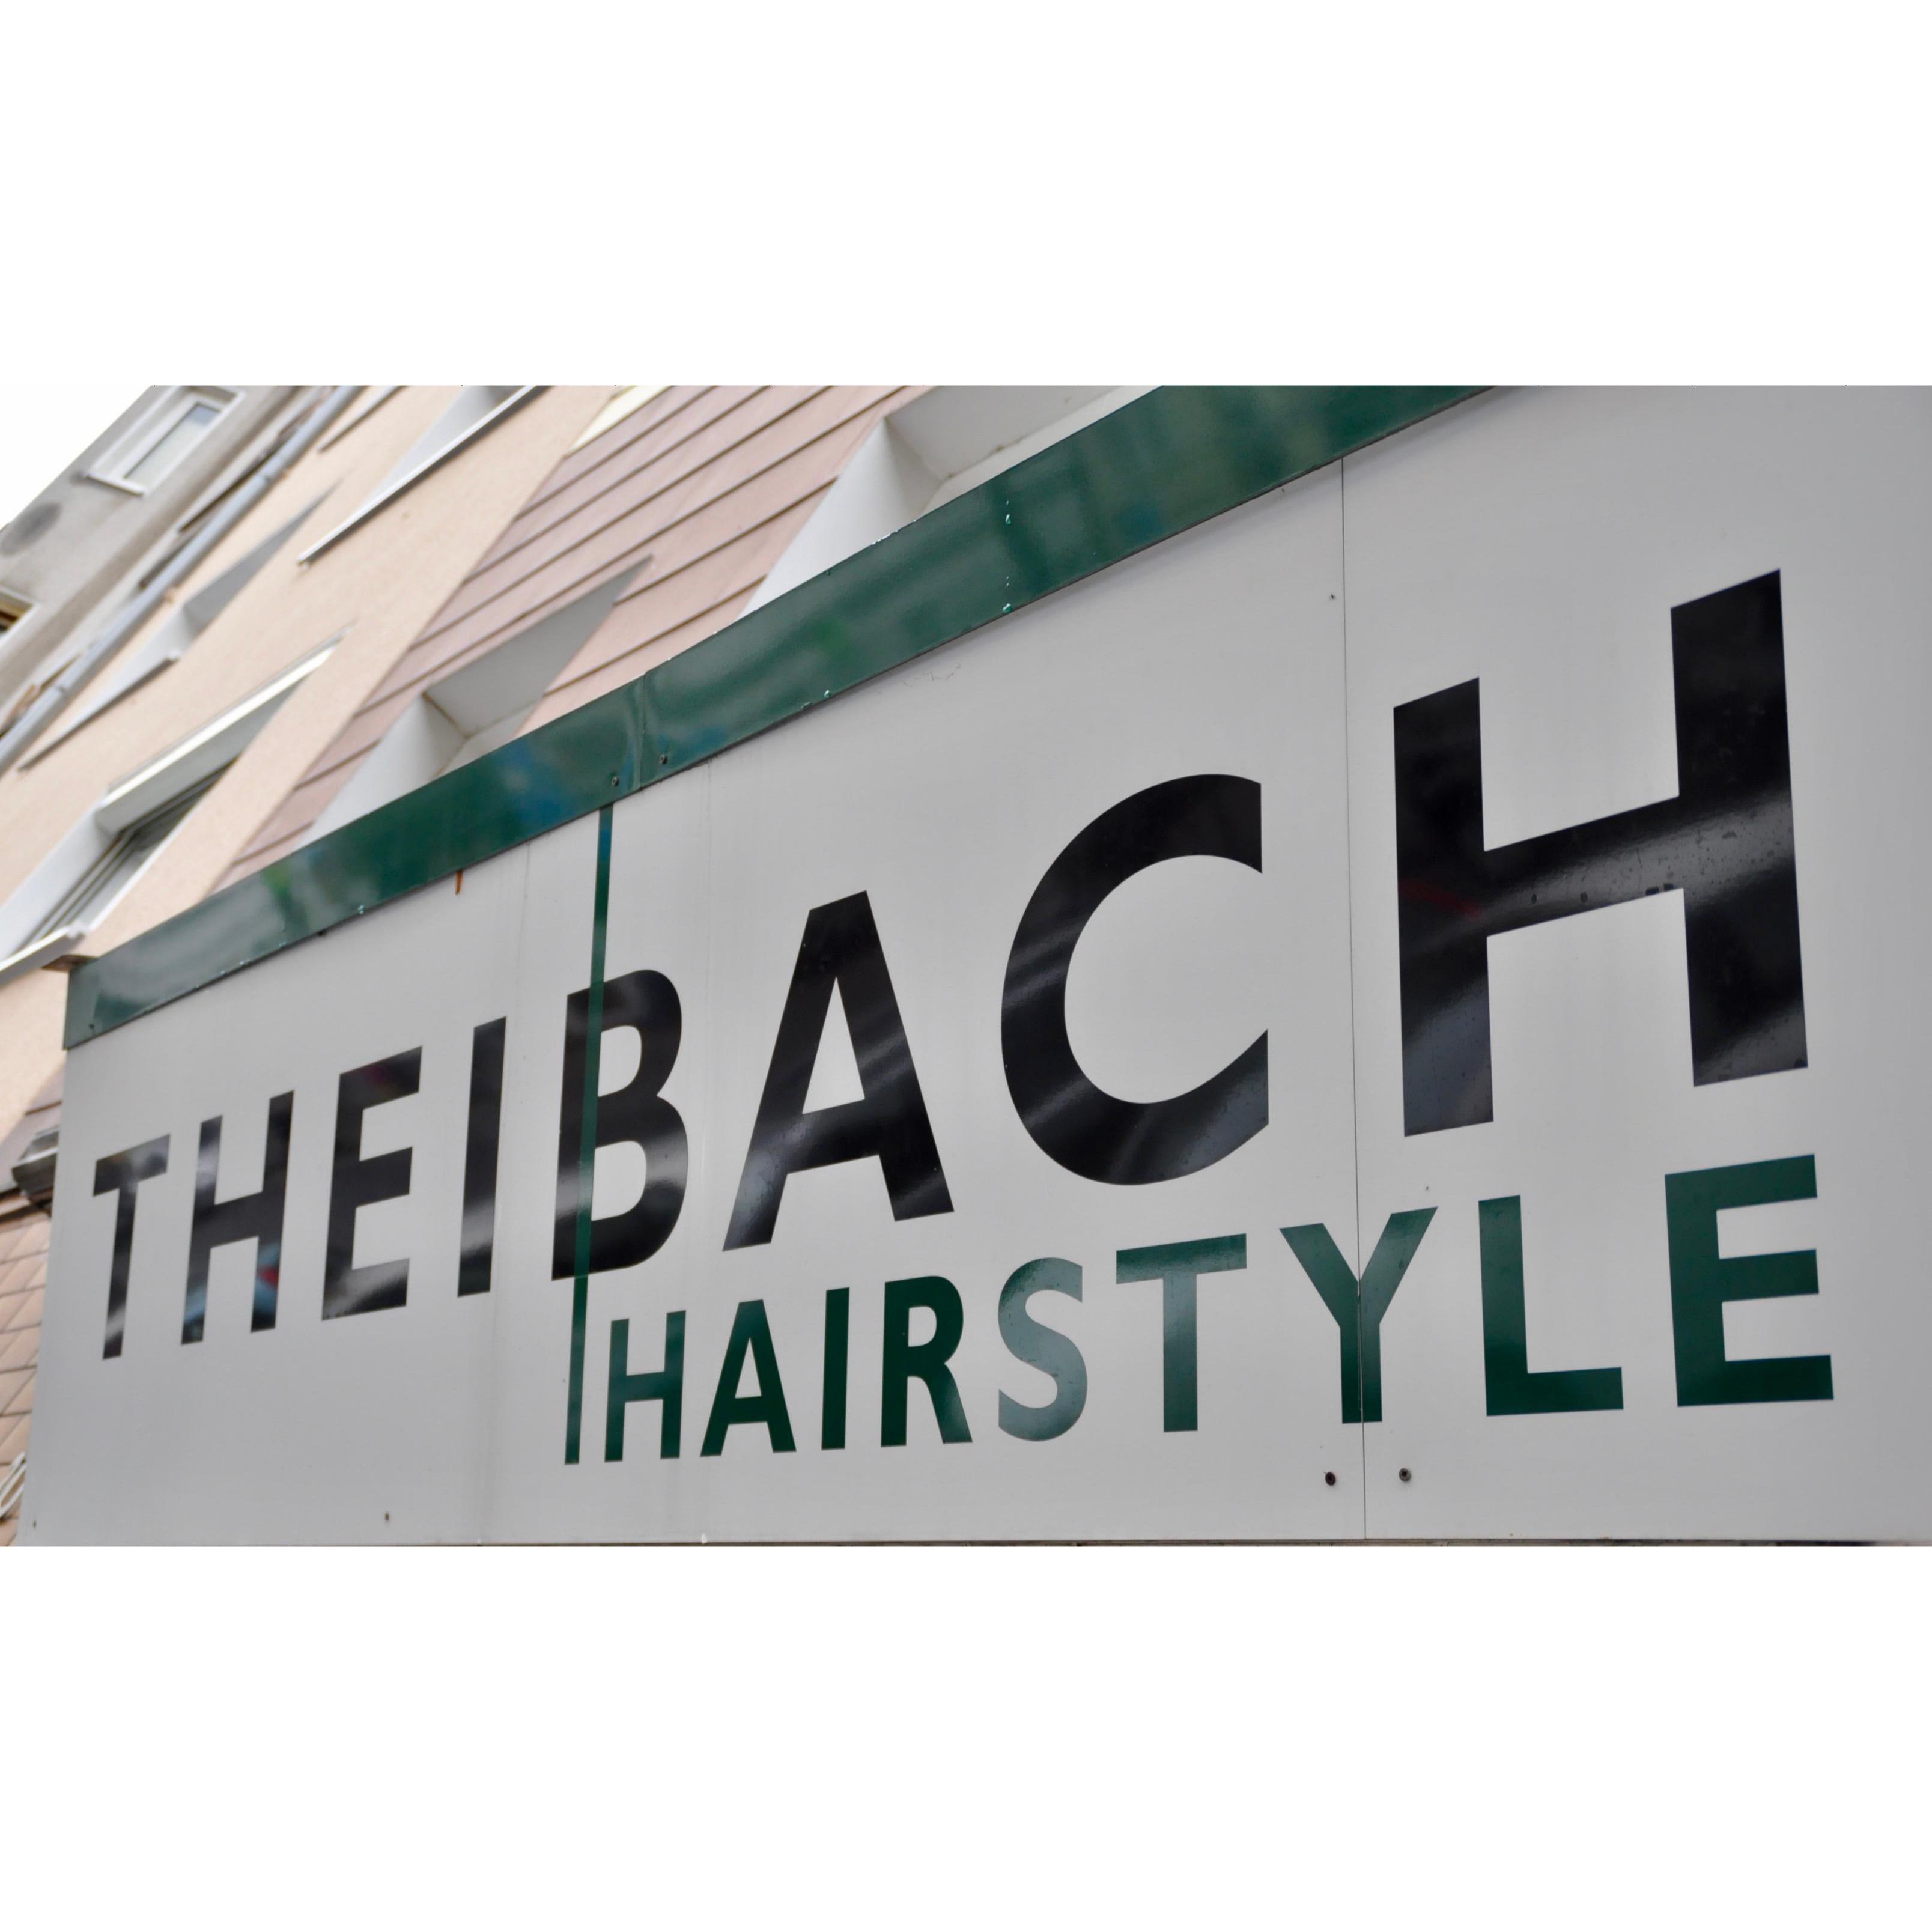 Theibach Hairstyle Köln